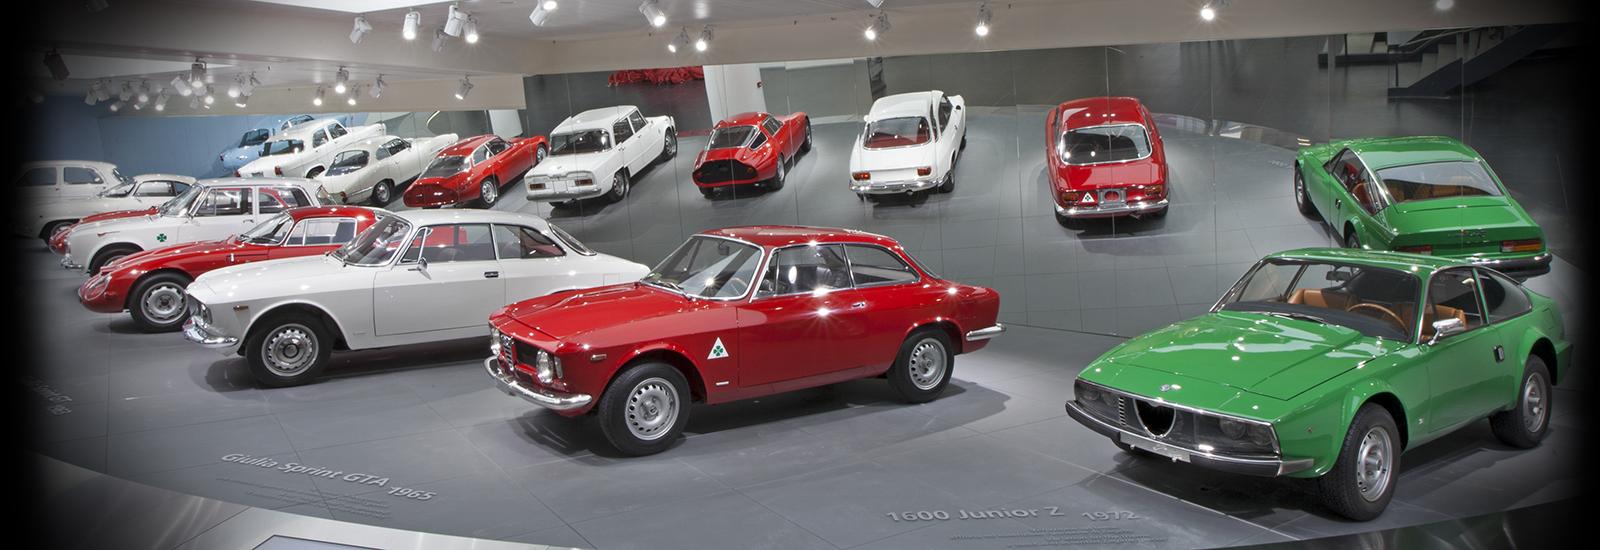 alfa%2Bromeo Δεν γνωρίζεις τι εστί Alfa Romeo άμα δεν γνωρίζεις την ιστορία της Alfa, alfa romeo, Alfa Romeo Soul, Alfisti, Giulia, Heritage, museoalfaromeo, videos, zblog